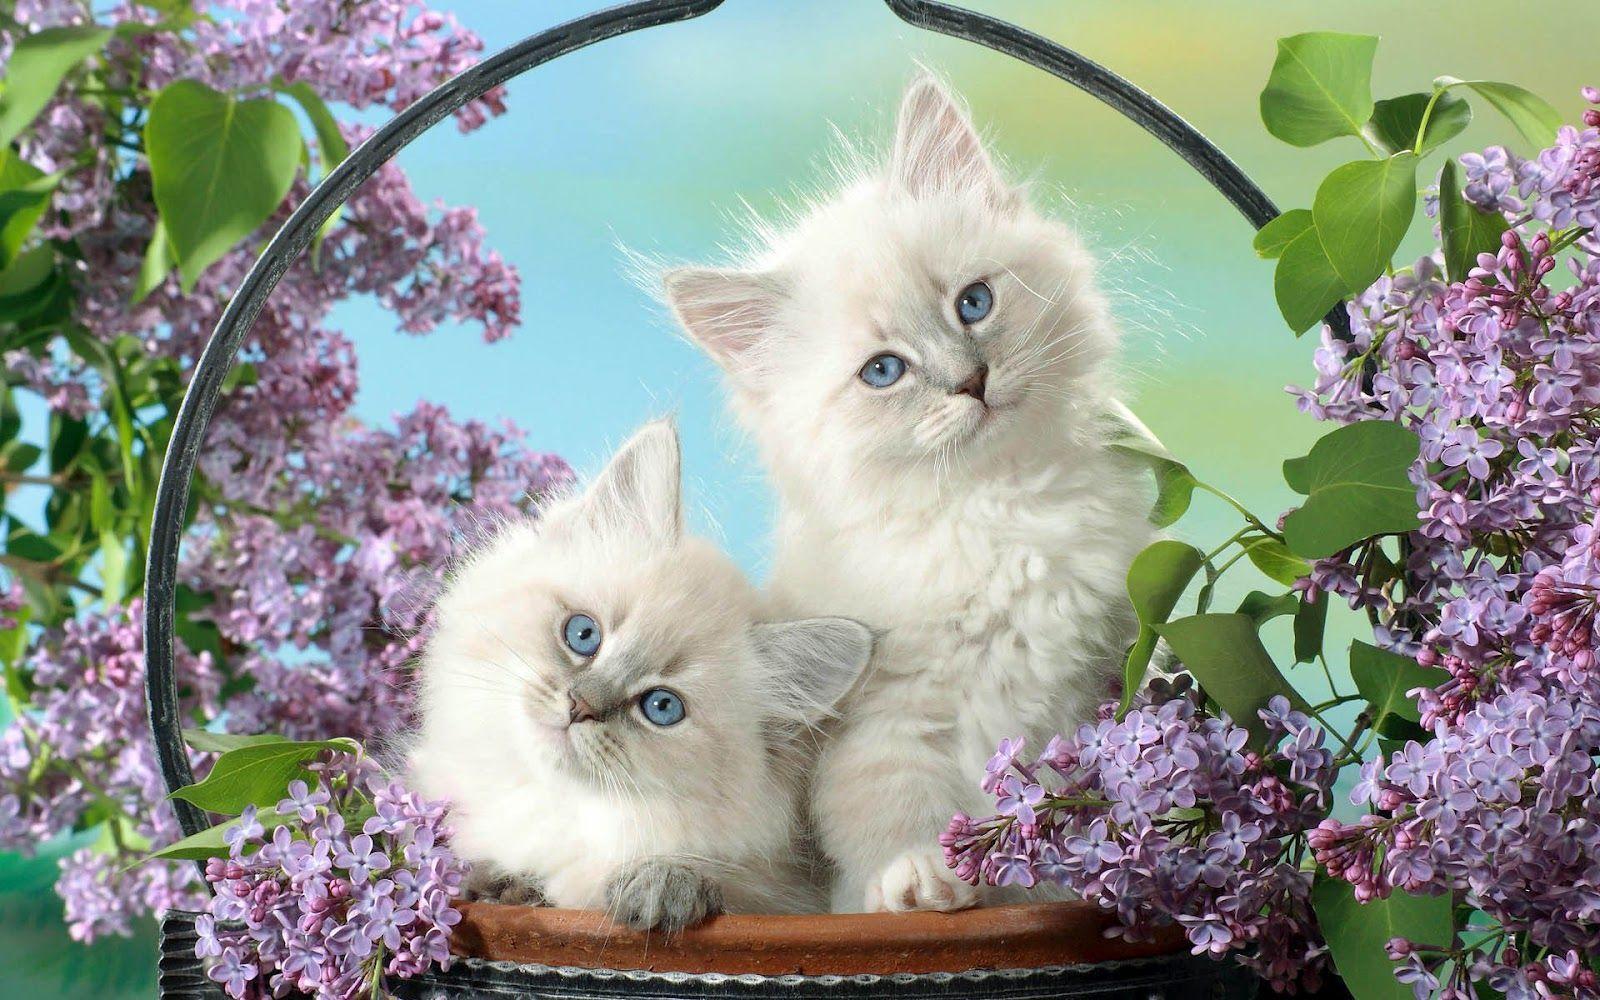 Hd wallpaper cat - Cats Hd Wallpapers Free Desk Wallpapers